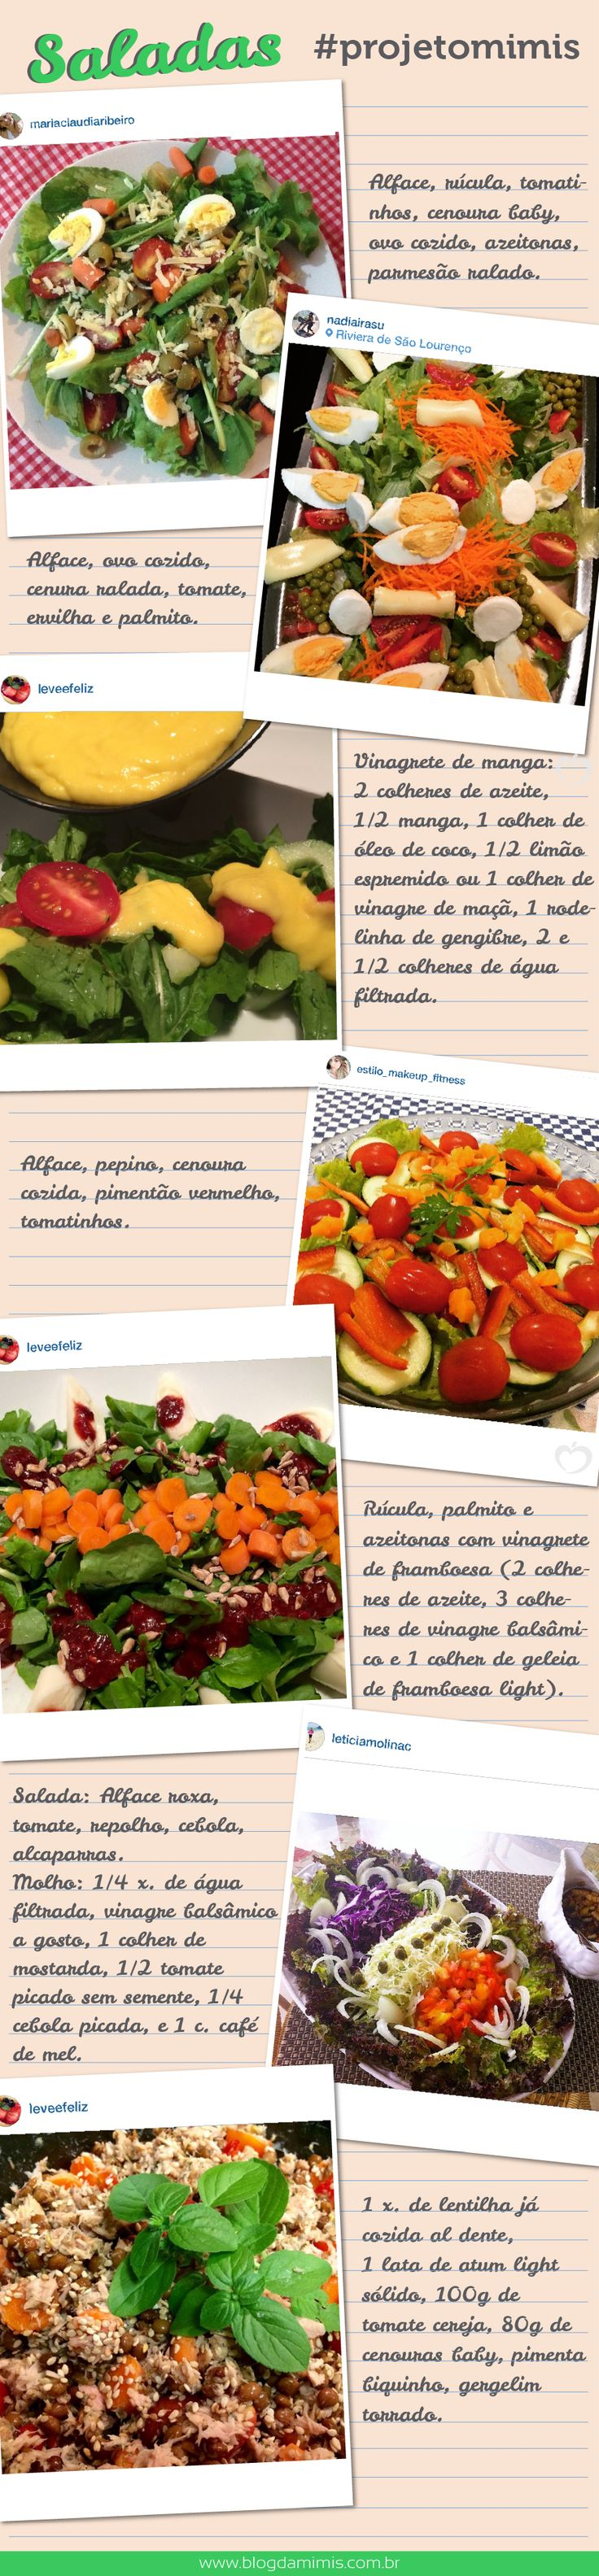 saladas-praticas-blog-da-mimis-michelle-franzoni-01